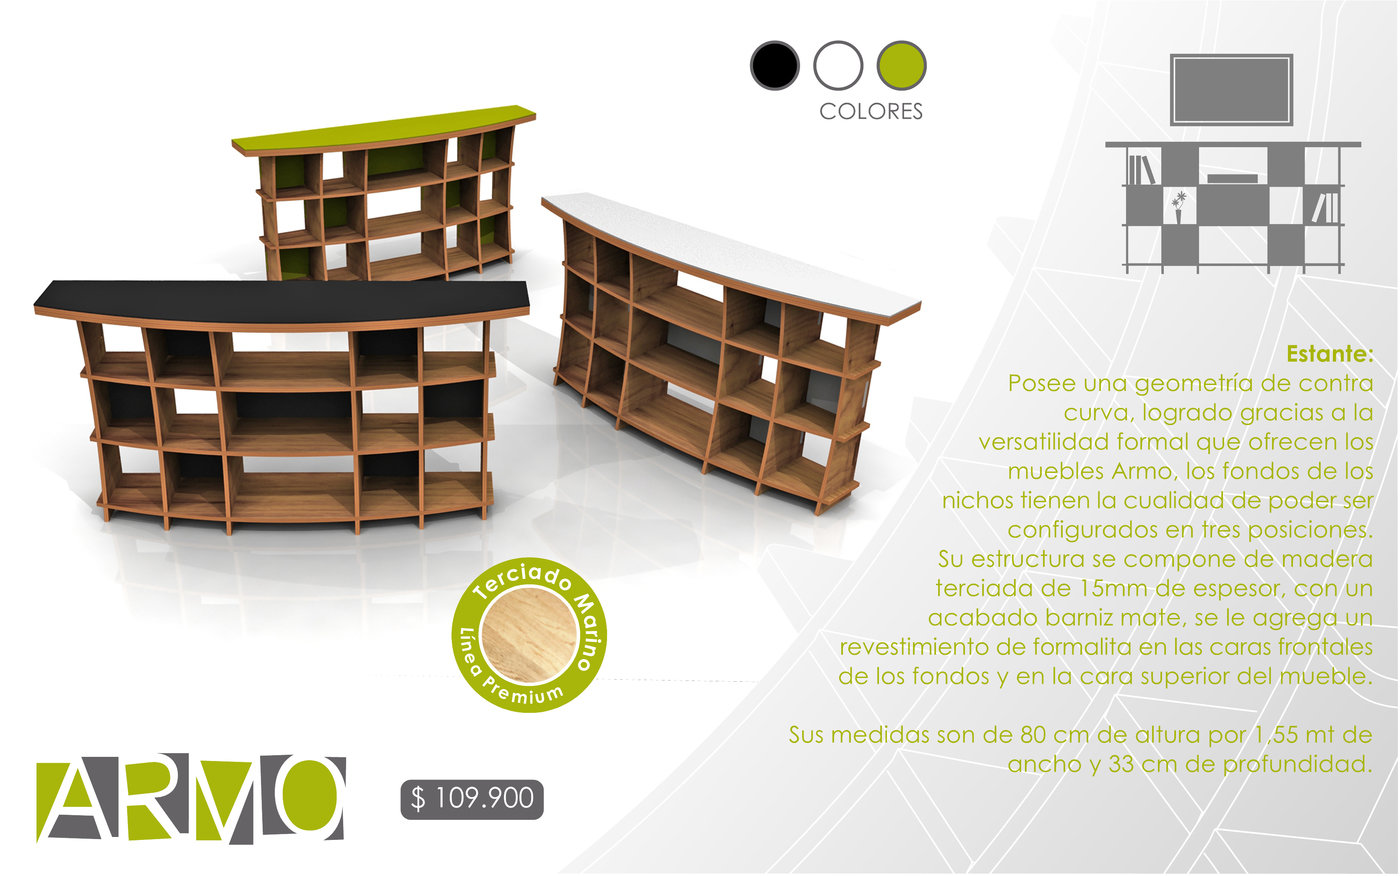 Muebles Armo By Sebastian Navarro Montero At Coroflot Com # Muebles Geometricos